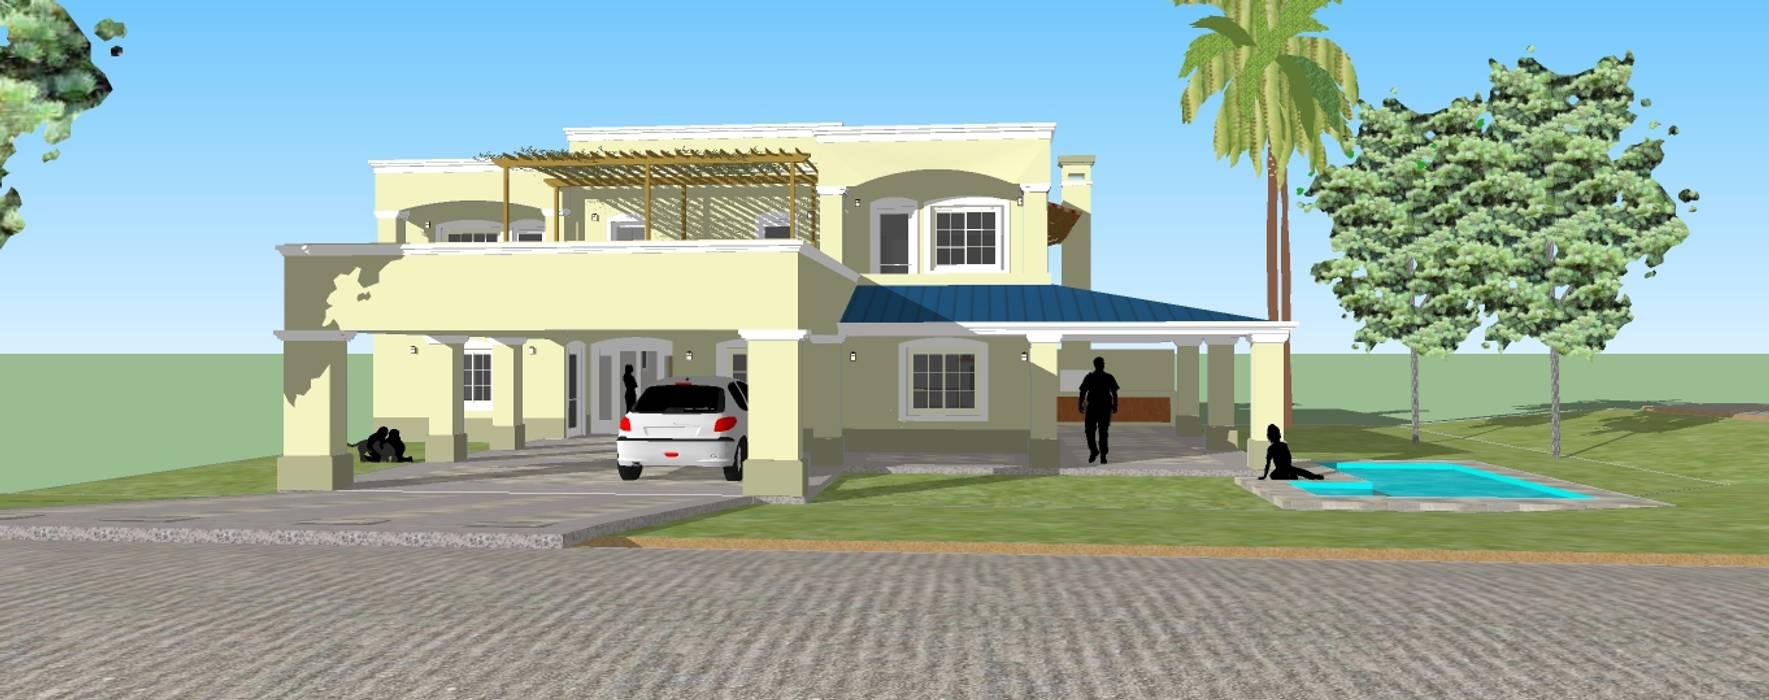 ESPACIO ARQ - Estudio Colonial style house Bricks Yellow